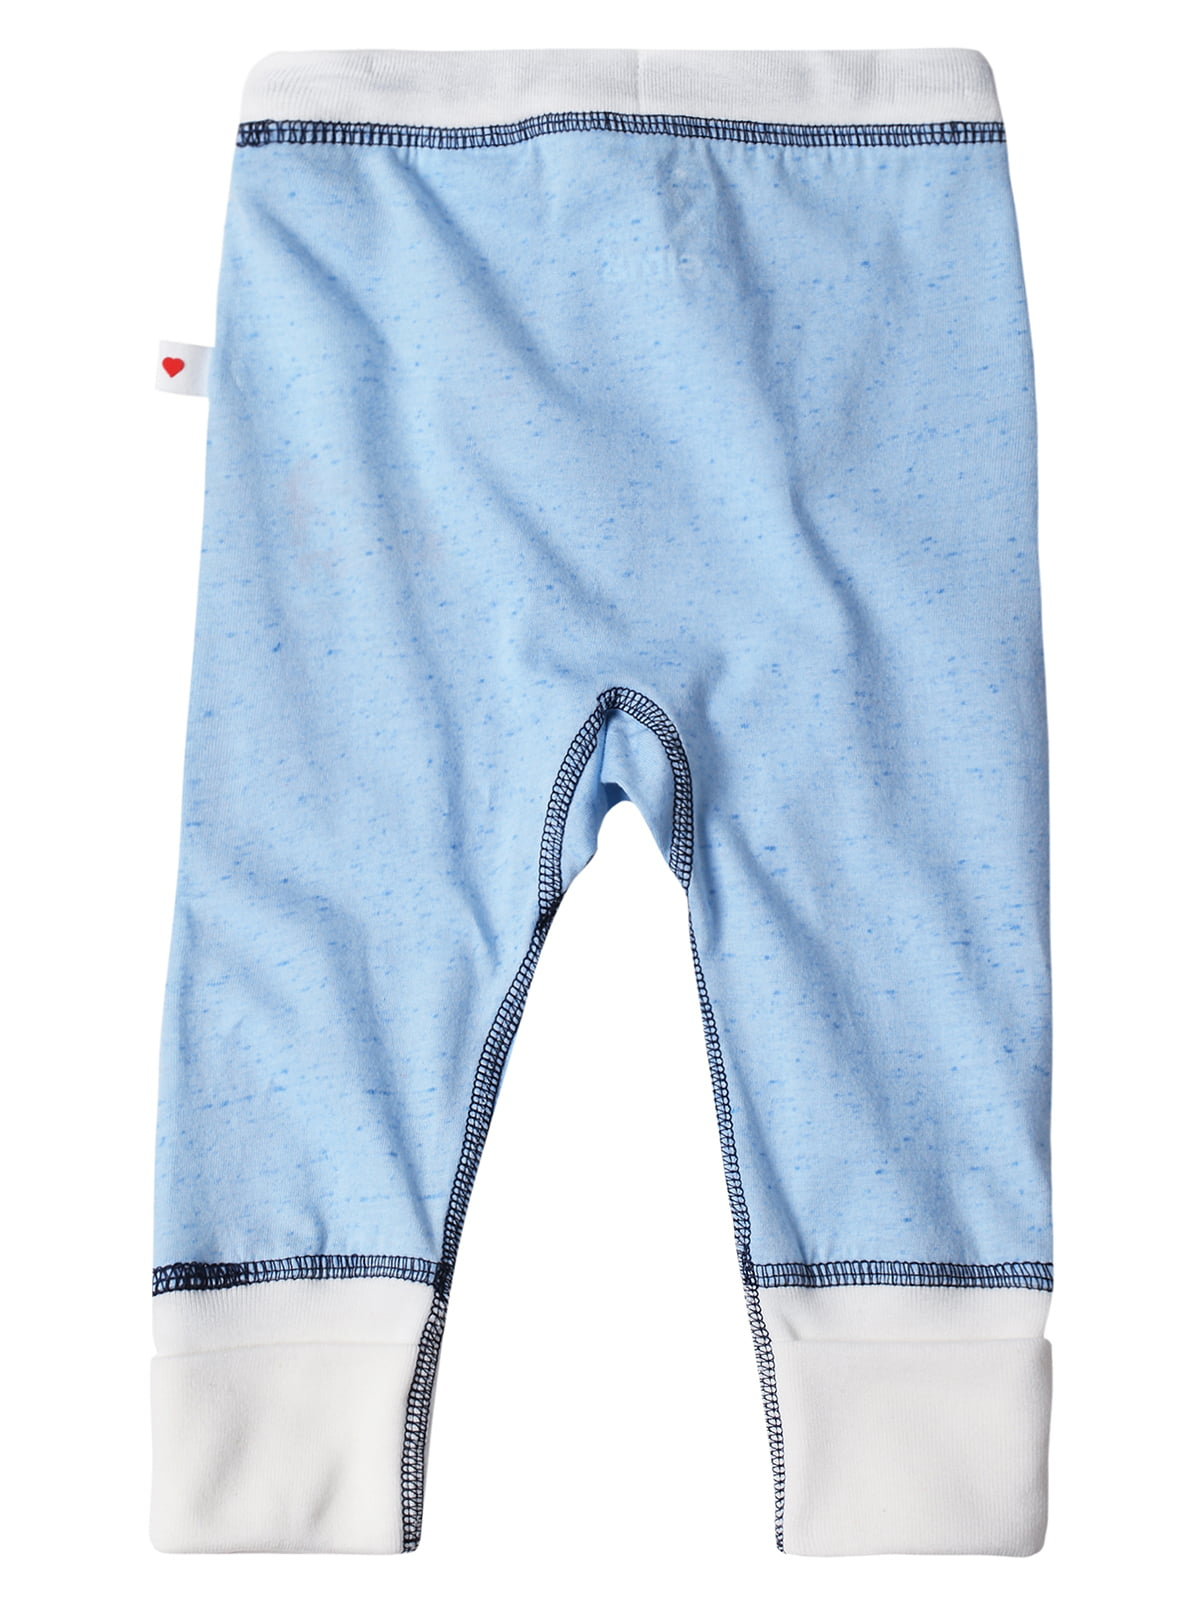 Штани біло-блакитні | 4659627 | фото 2